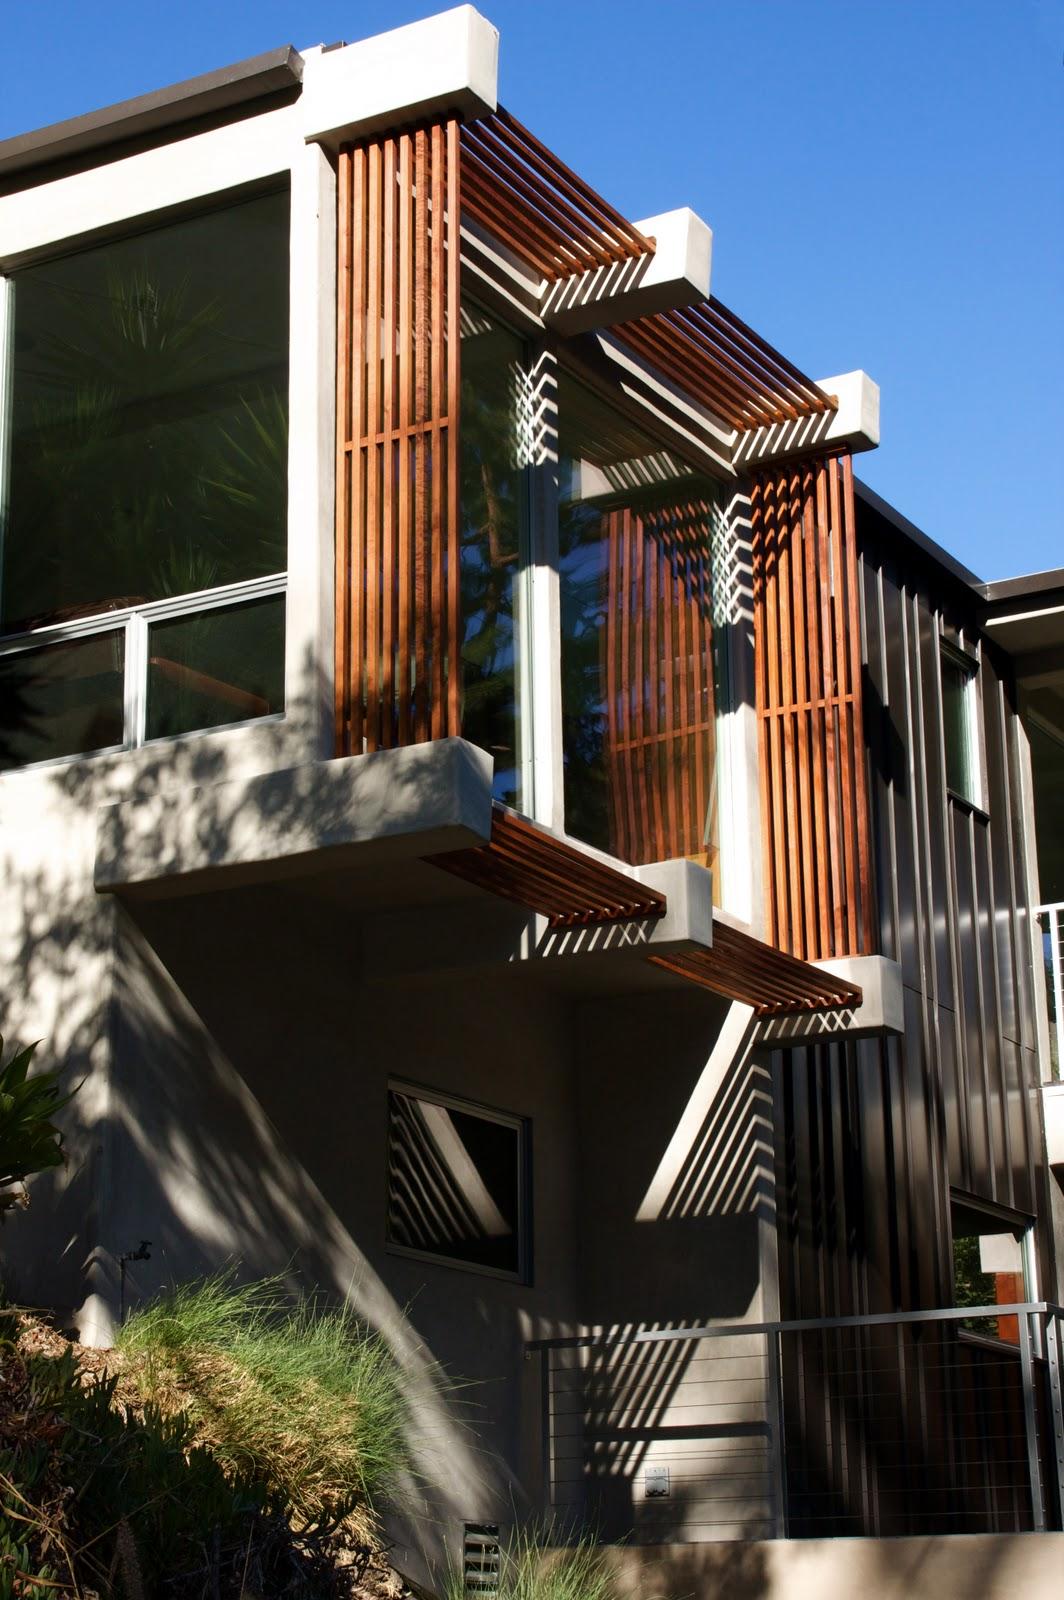 Talkitect | architecture and urbanism: 2010